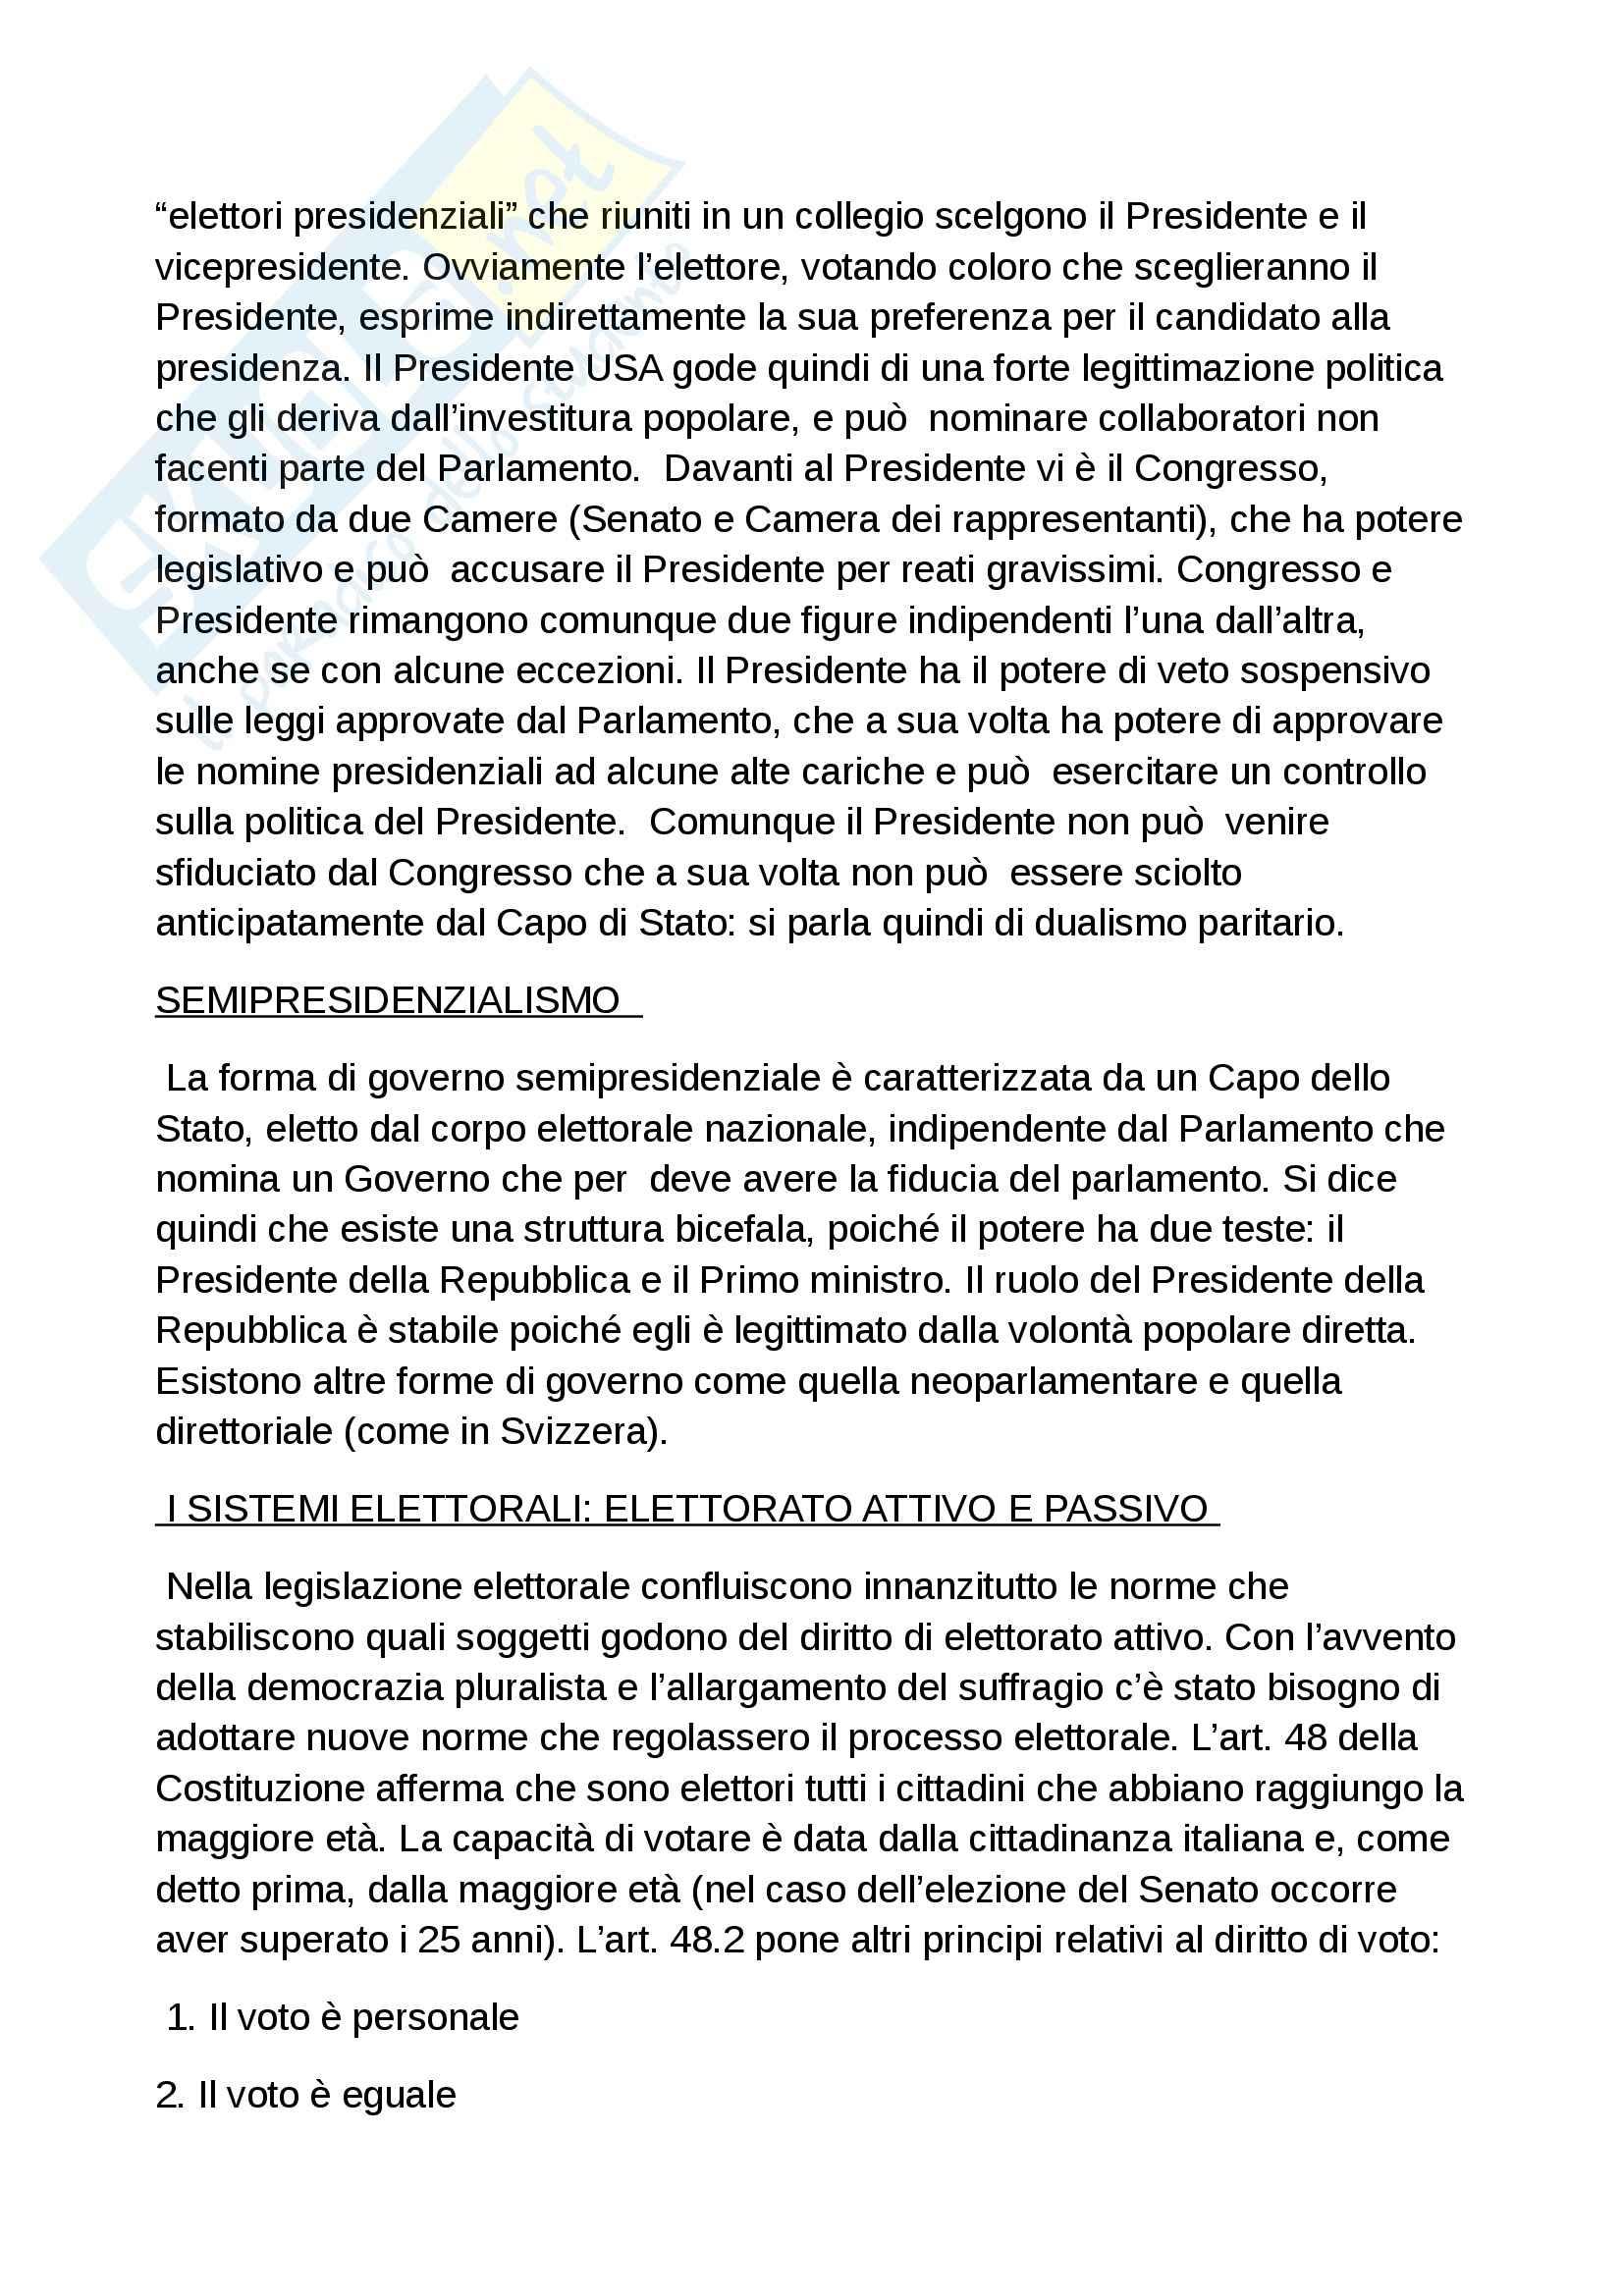 Riassunto esame diritto costituzionale, prof. Grosso, libro Diritto costituzionale, Bin, Pitruzzella Pag. 31